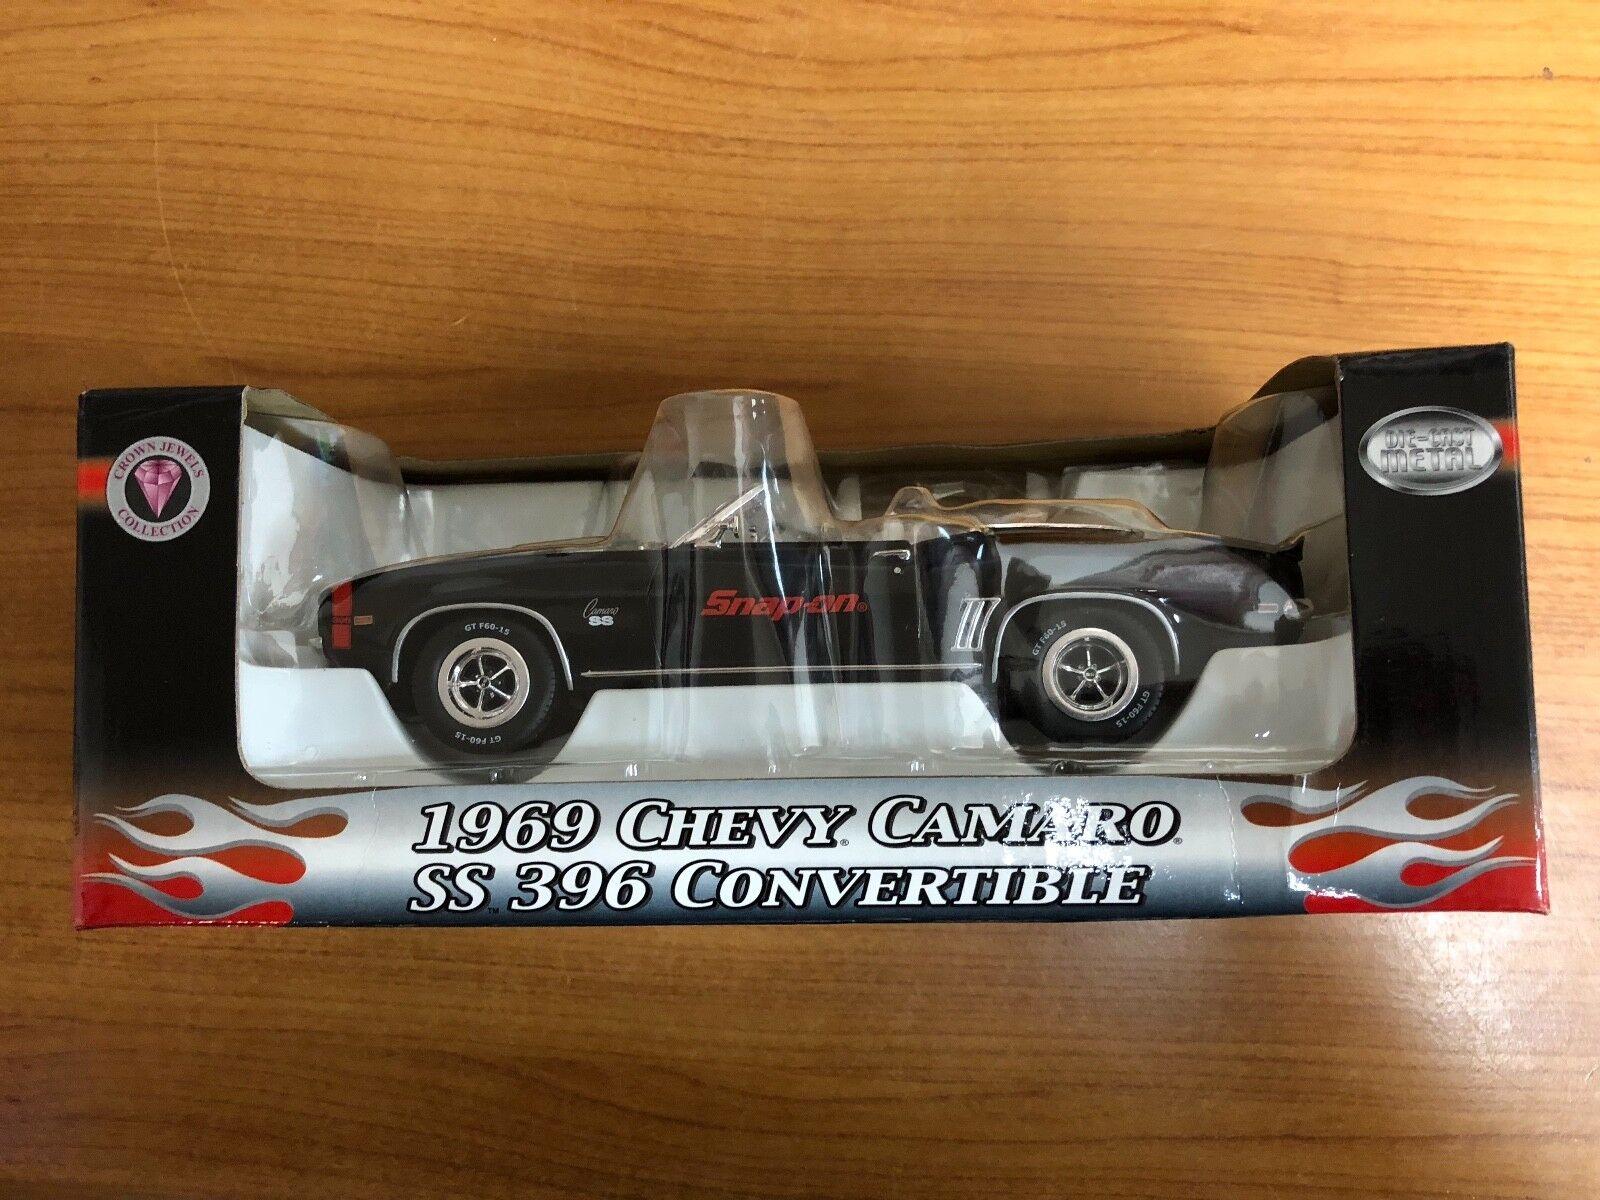 mejor opcion Snap on 1969 Chevy Camaro Ss Ss Ss 396 1 24 Scale Die Cast  a la venta